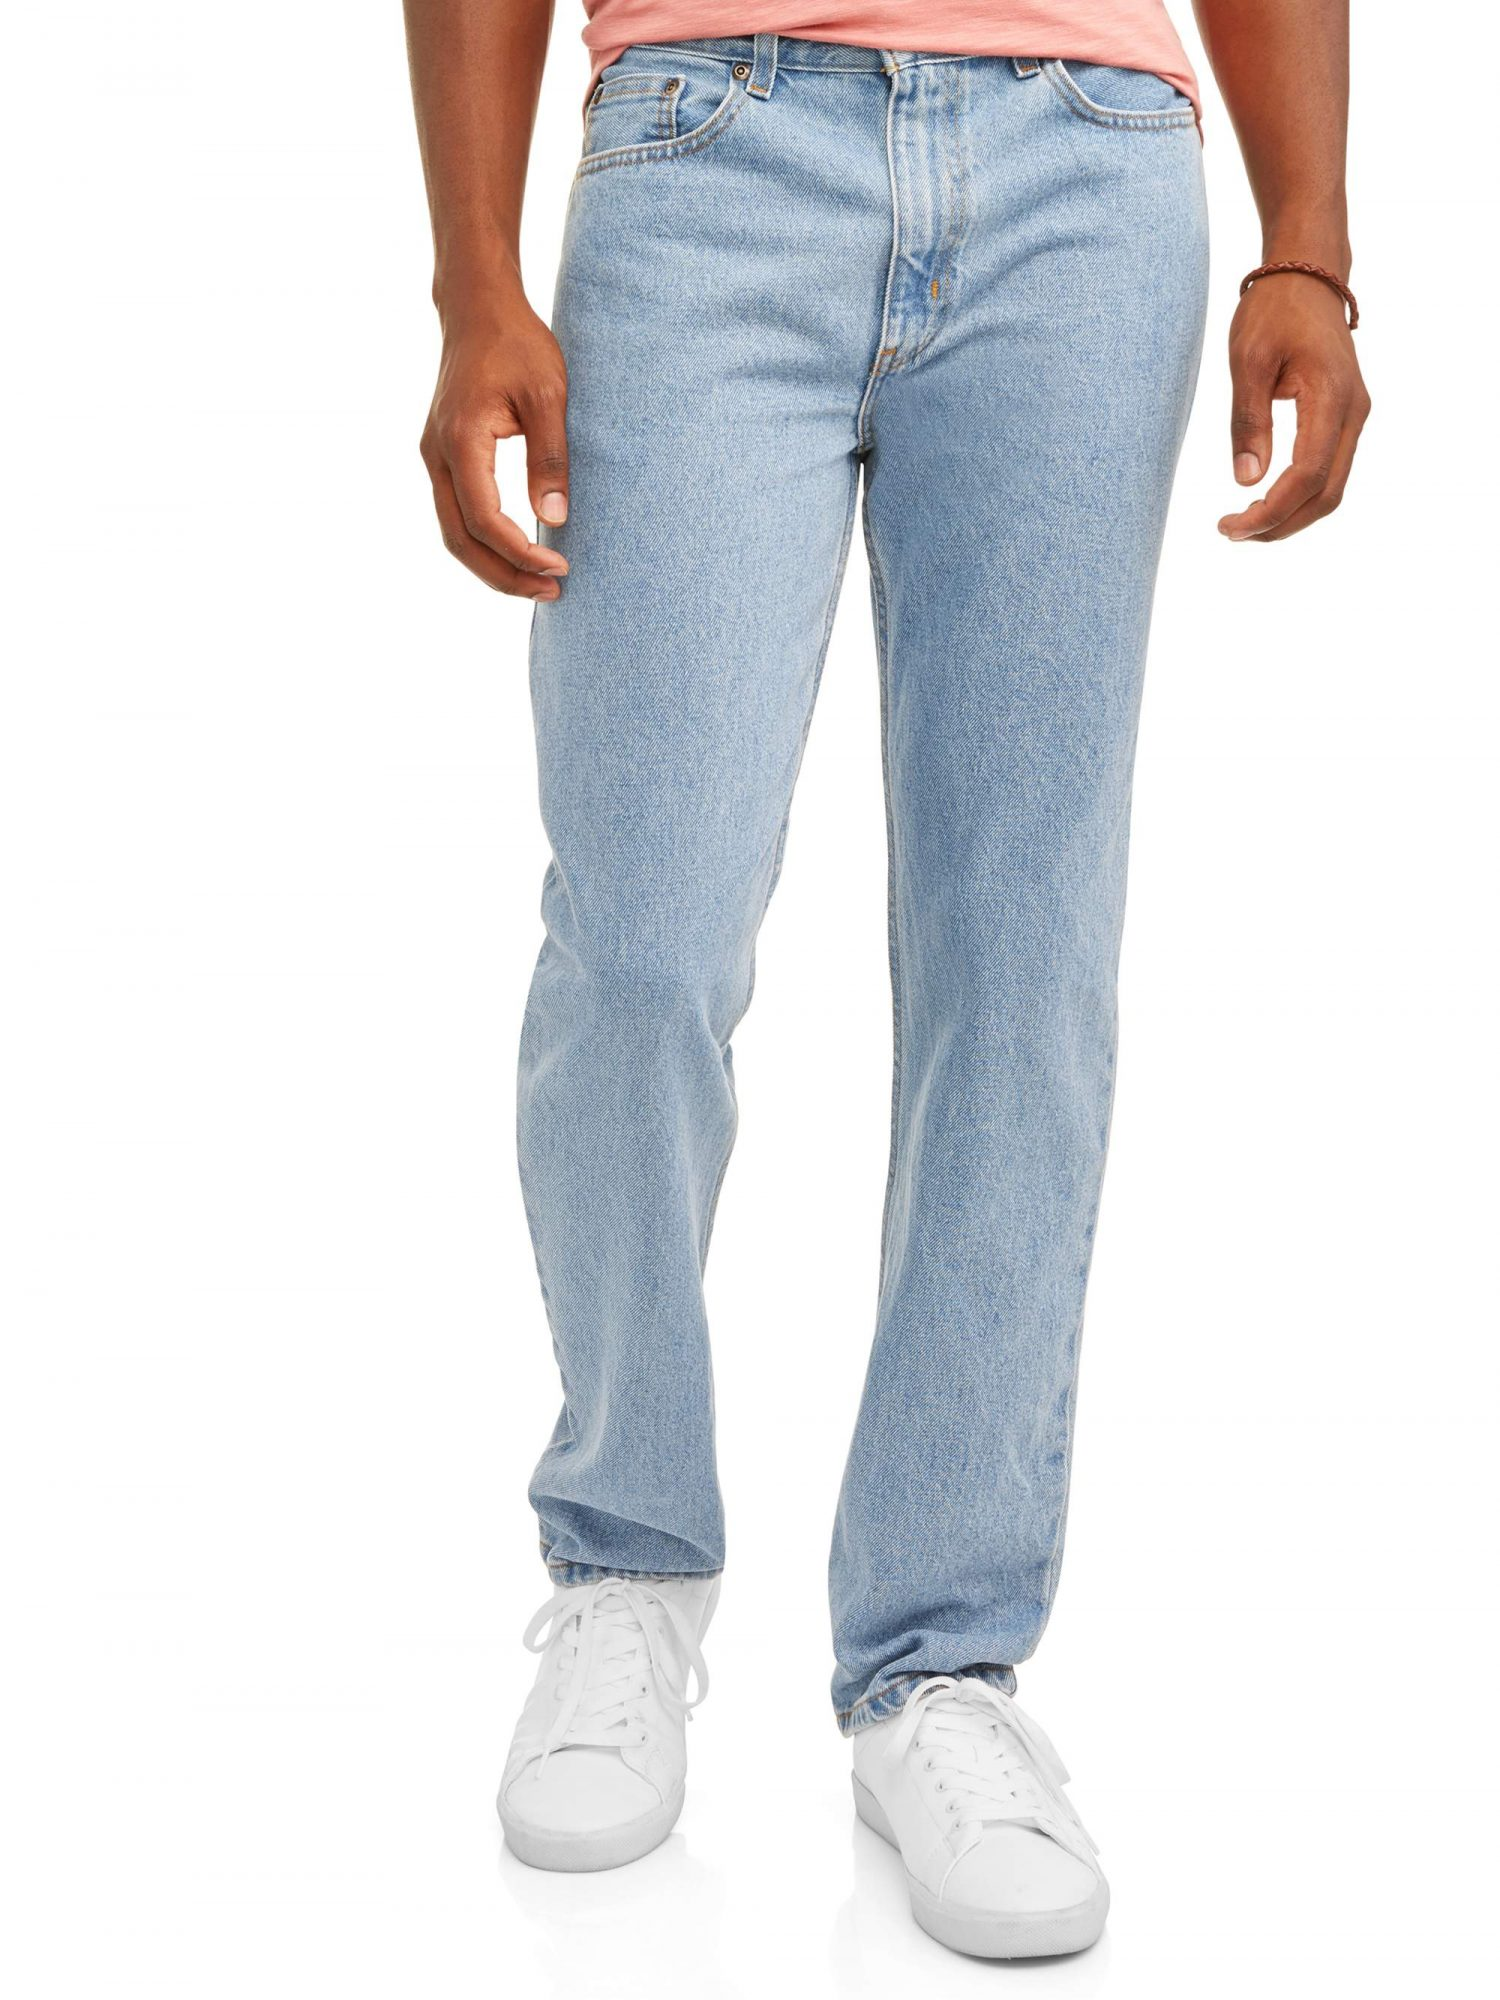 walmart jeans, tiktok